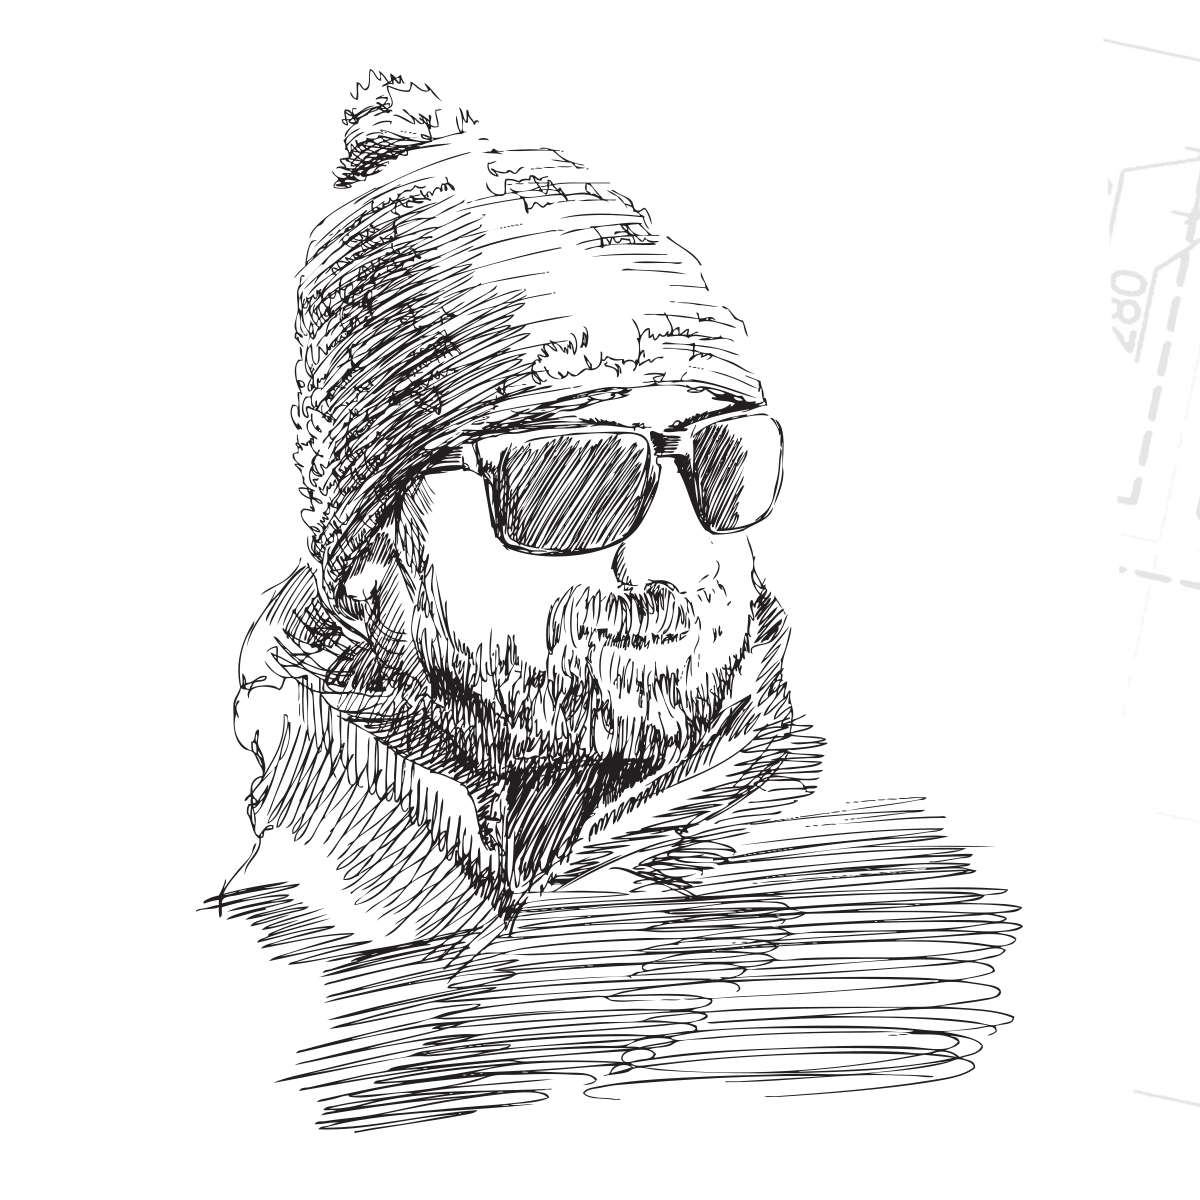 http://ra-zoom.kz/wp-content/uploads/2017/05/minimalist-image-team-member-02-large.png